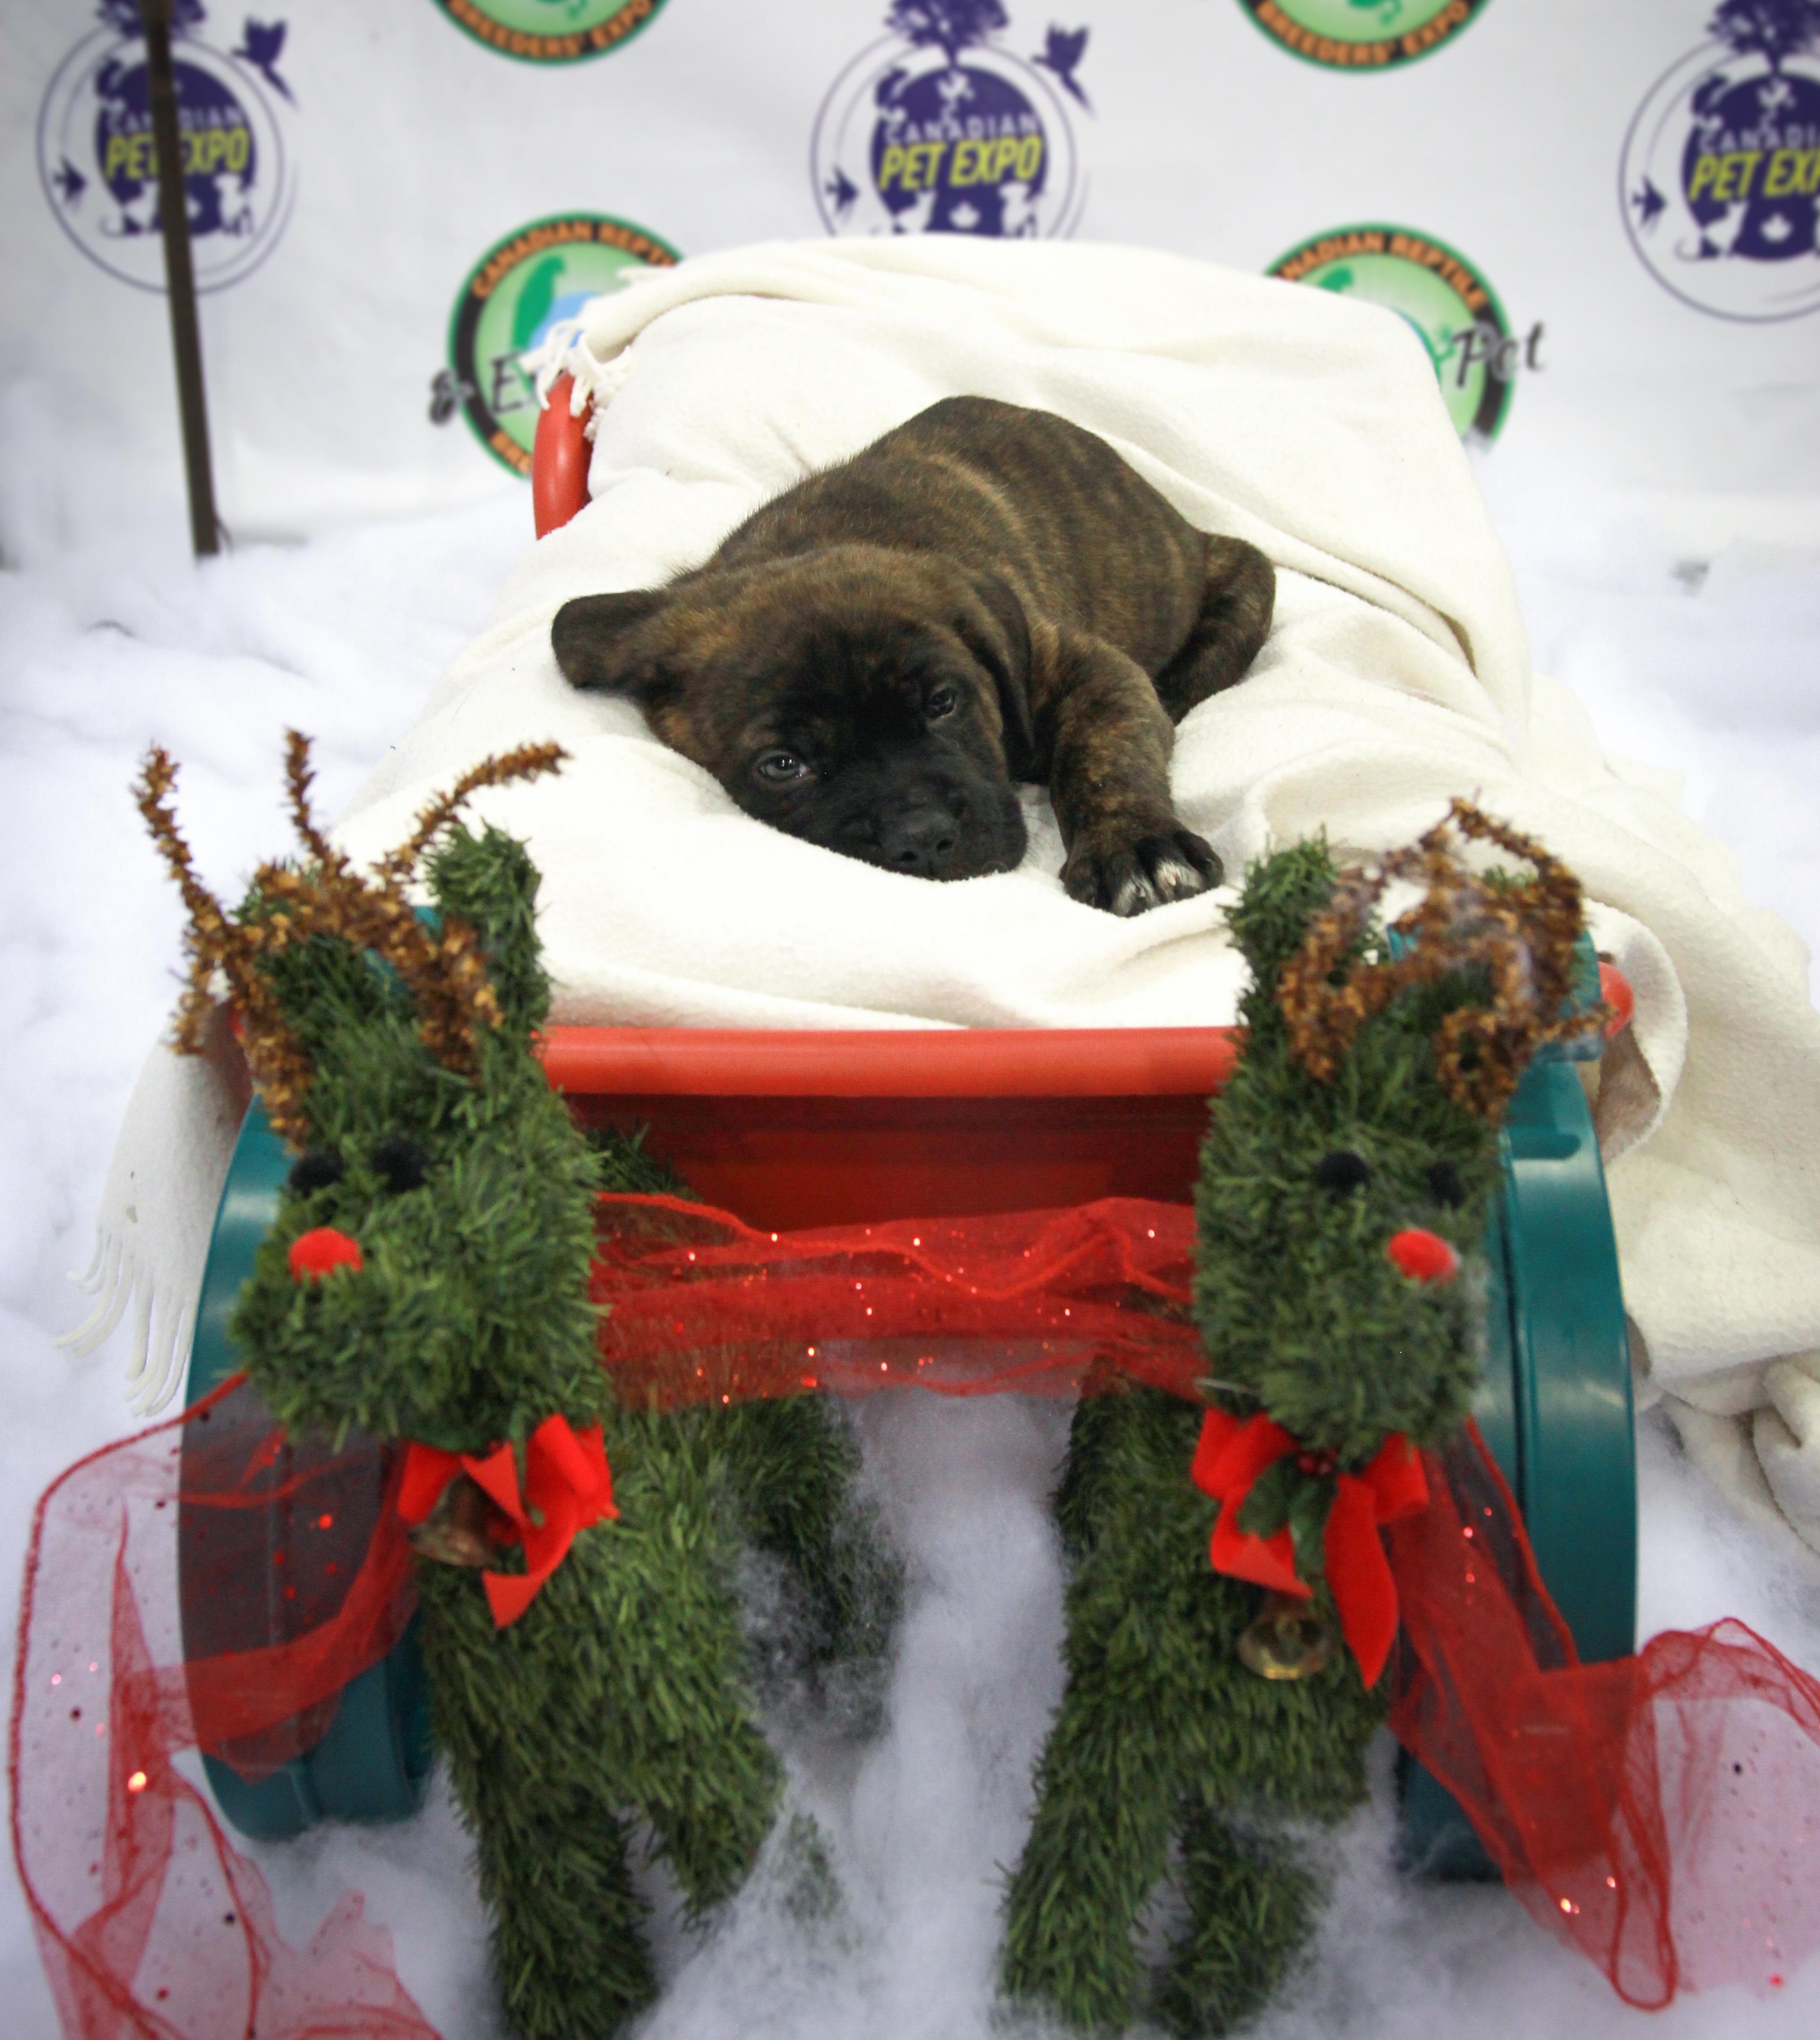 Christmas Pet Expo Scottsdale 2020 Durriken the Cane Corso cross Bull Mastiff puppy at Canadian